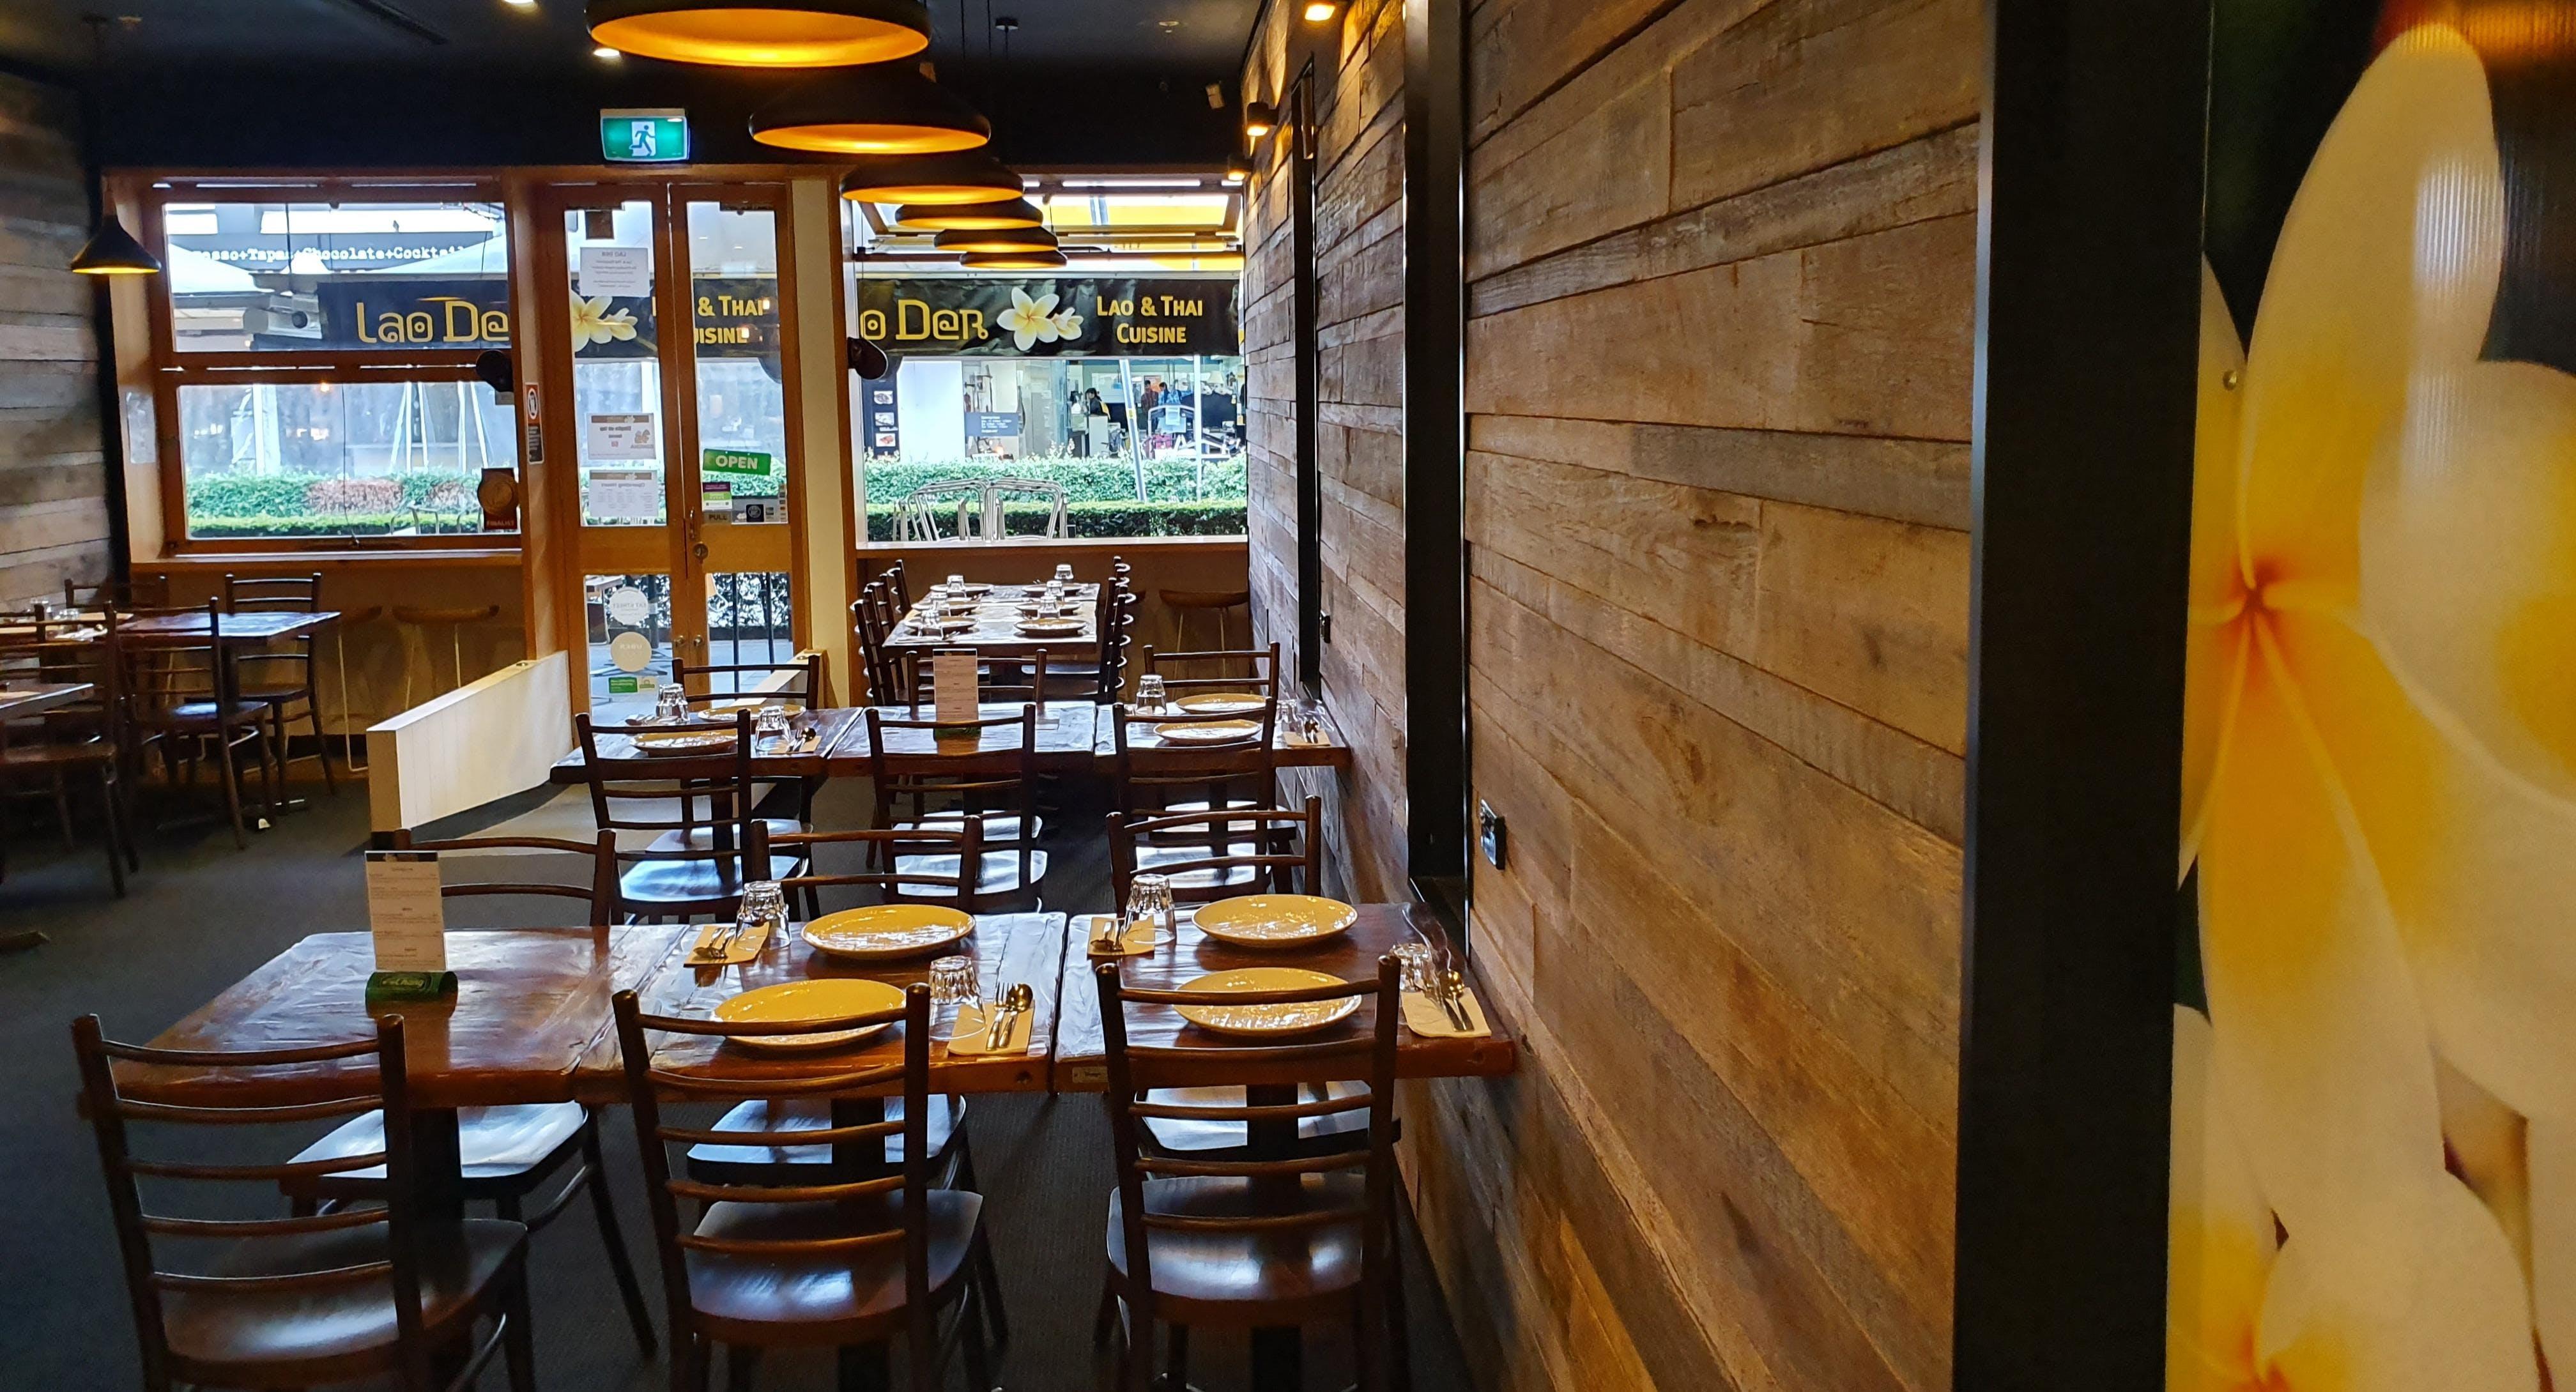 Lao Der Lao & Thai Cuisine Sydney image 2